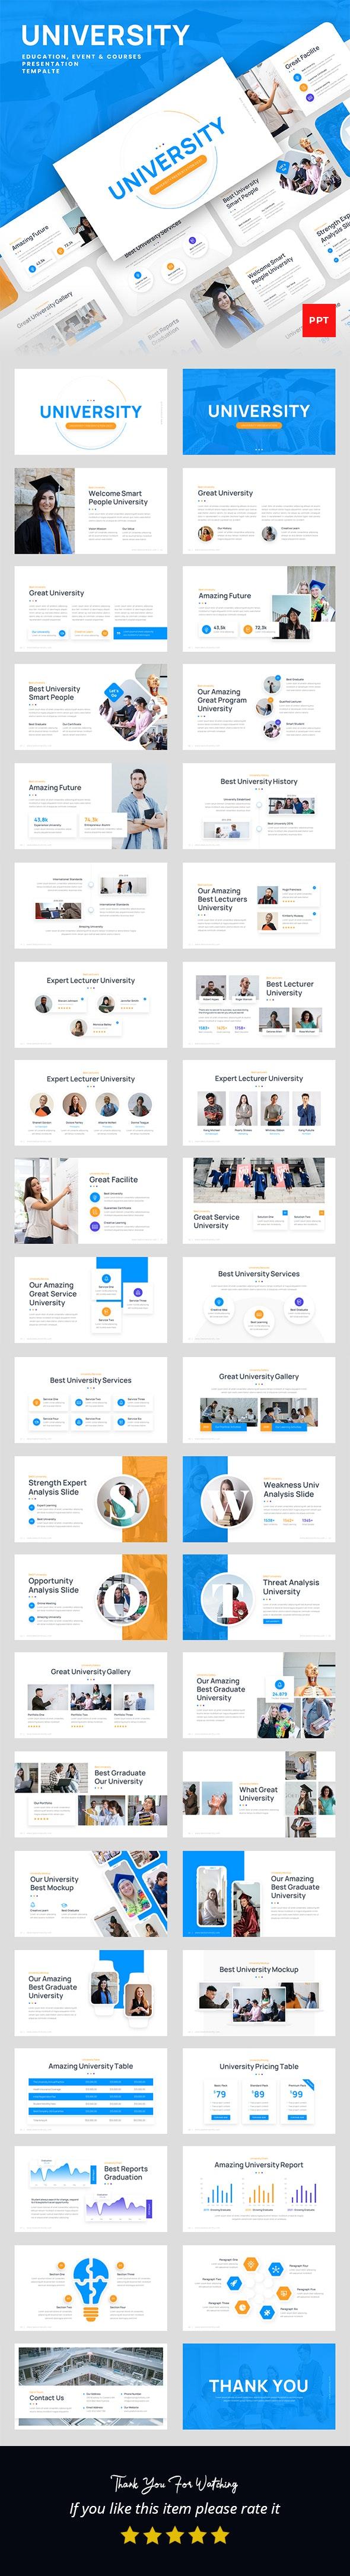 University - Education, Event & Course PowerPoint Presentation Template - Business PowerPoint Templates